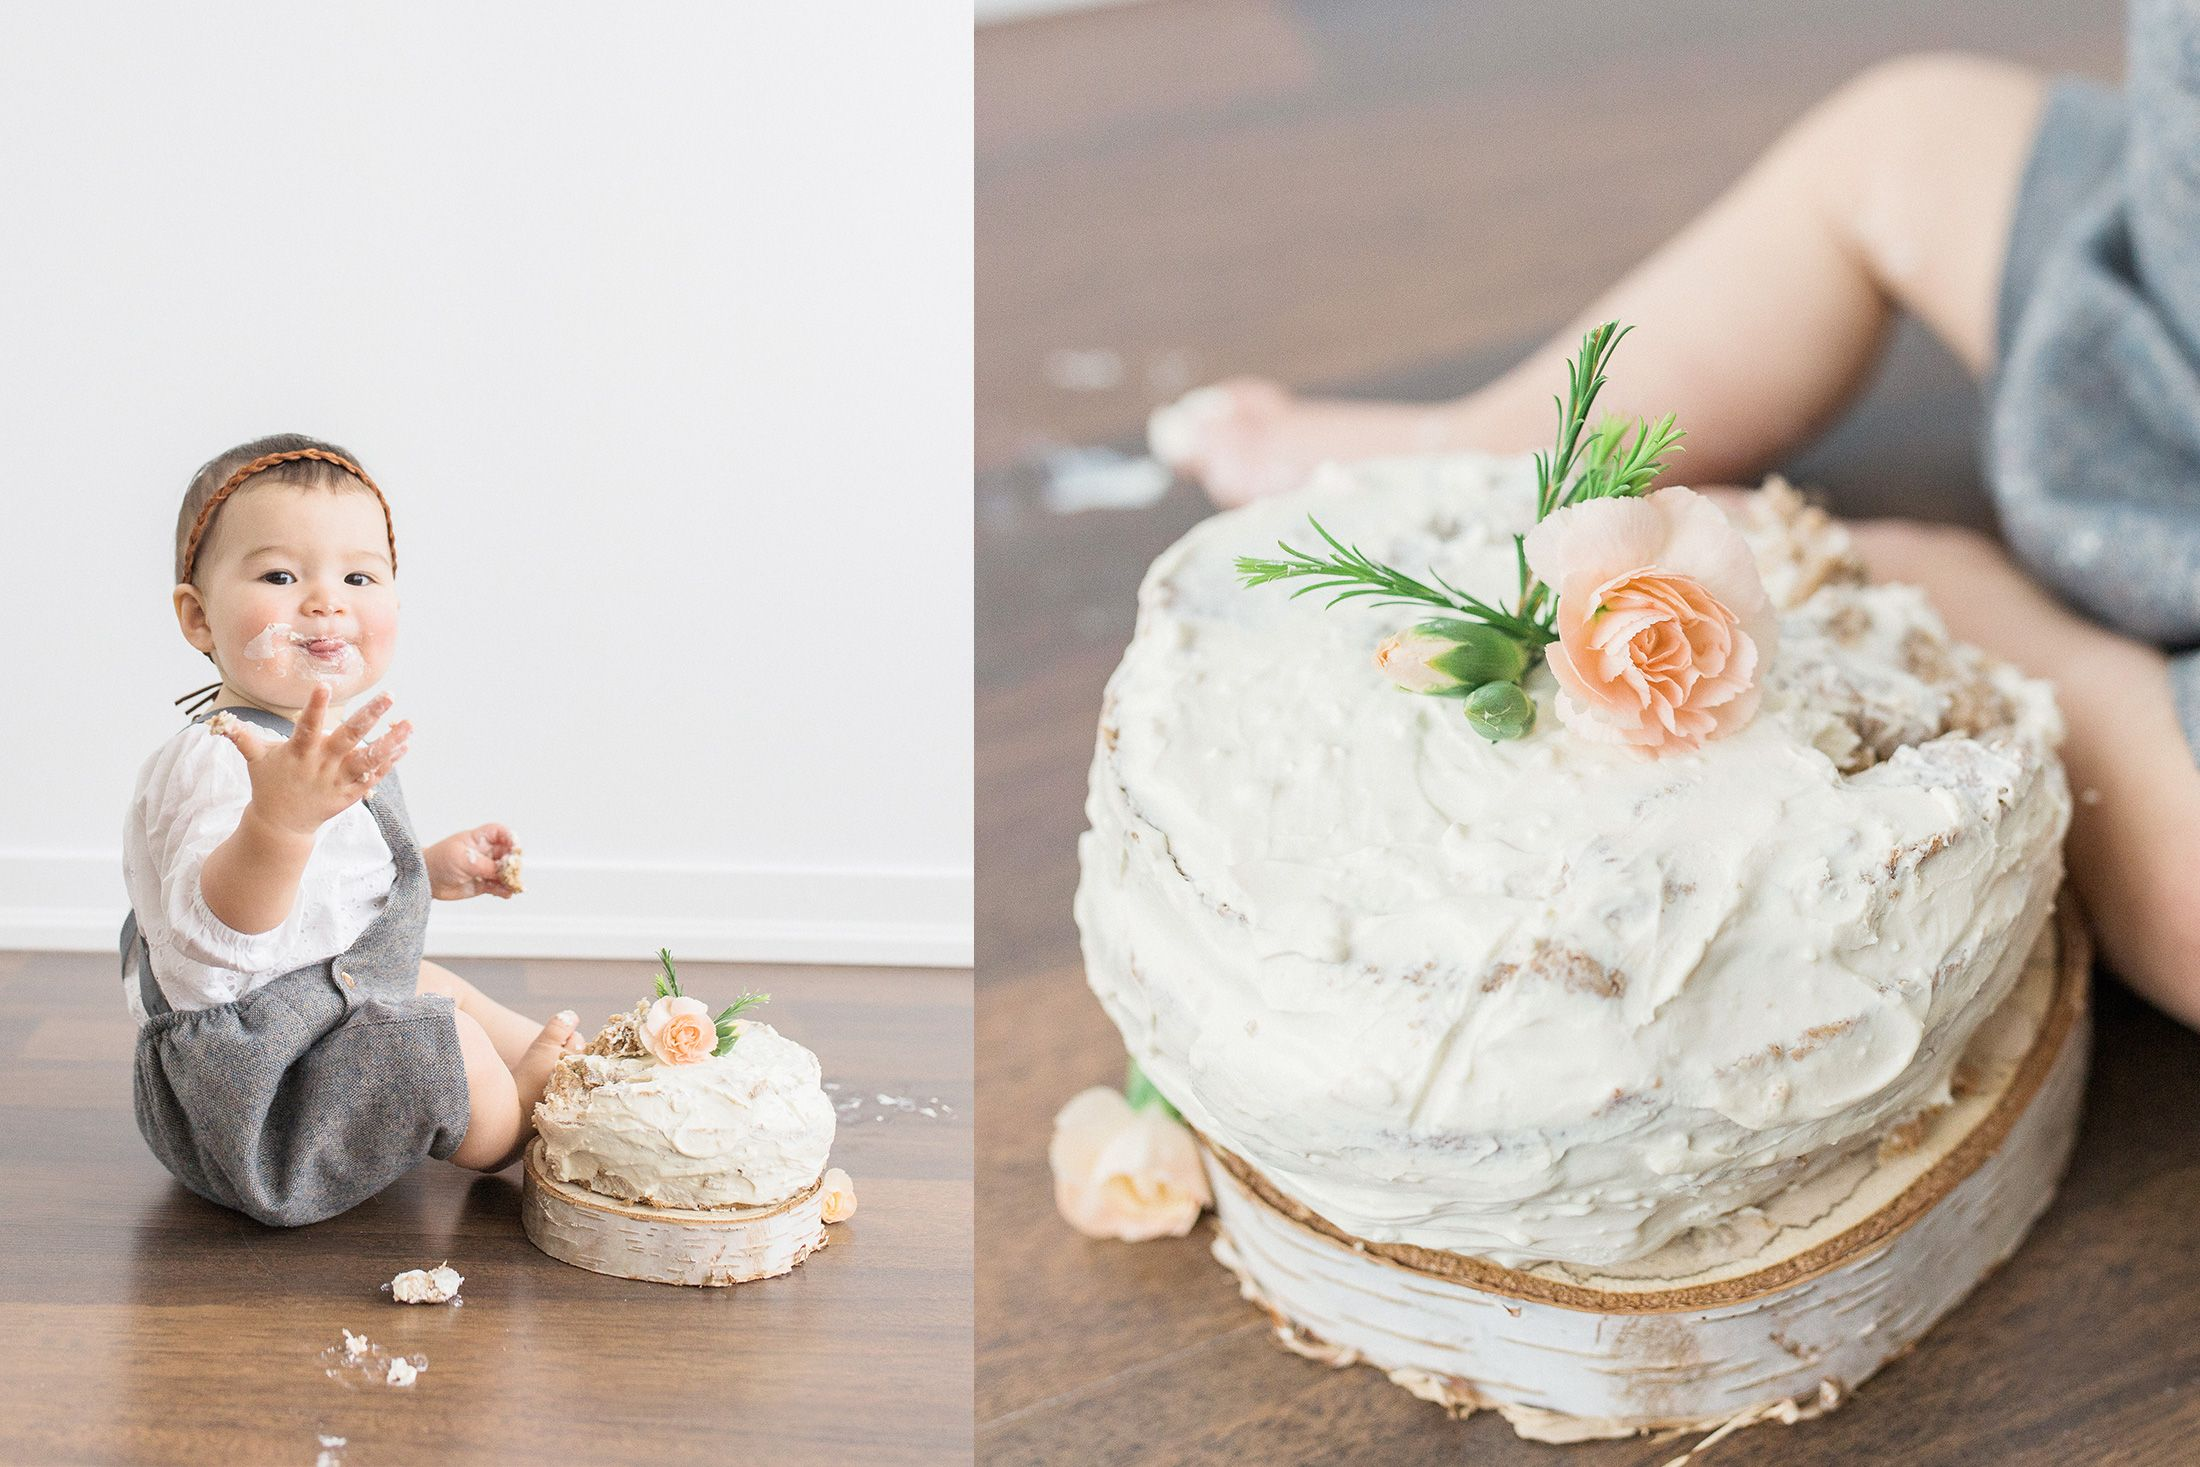 Sensational Recipe Healthy Sugar Free Smash Cake For Babys Birthday Smash Personalised Birthday Cards Arneslily Jamesorg